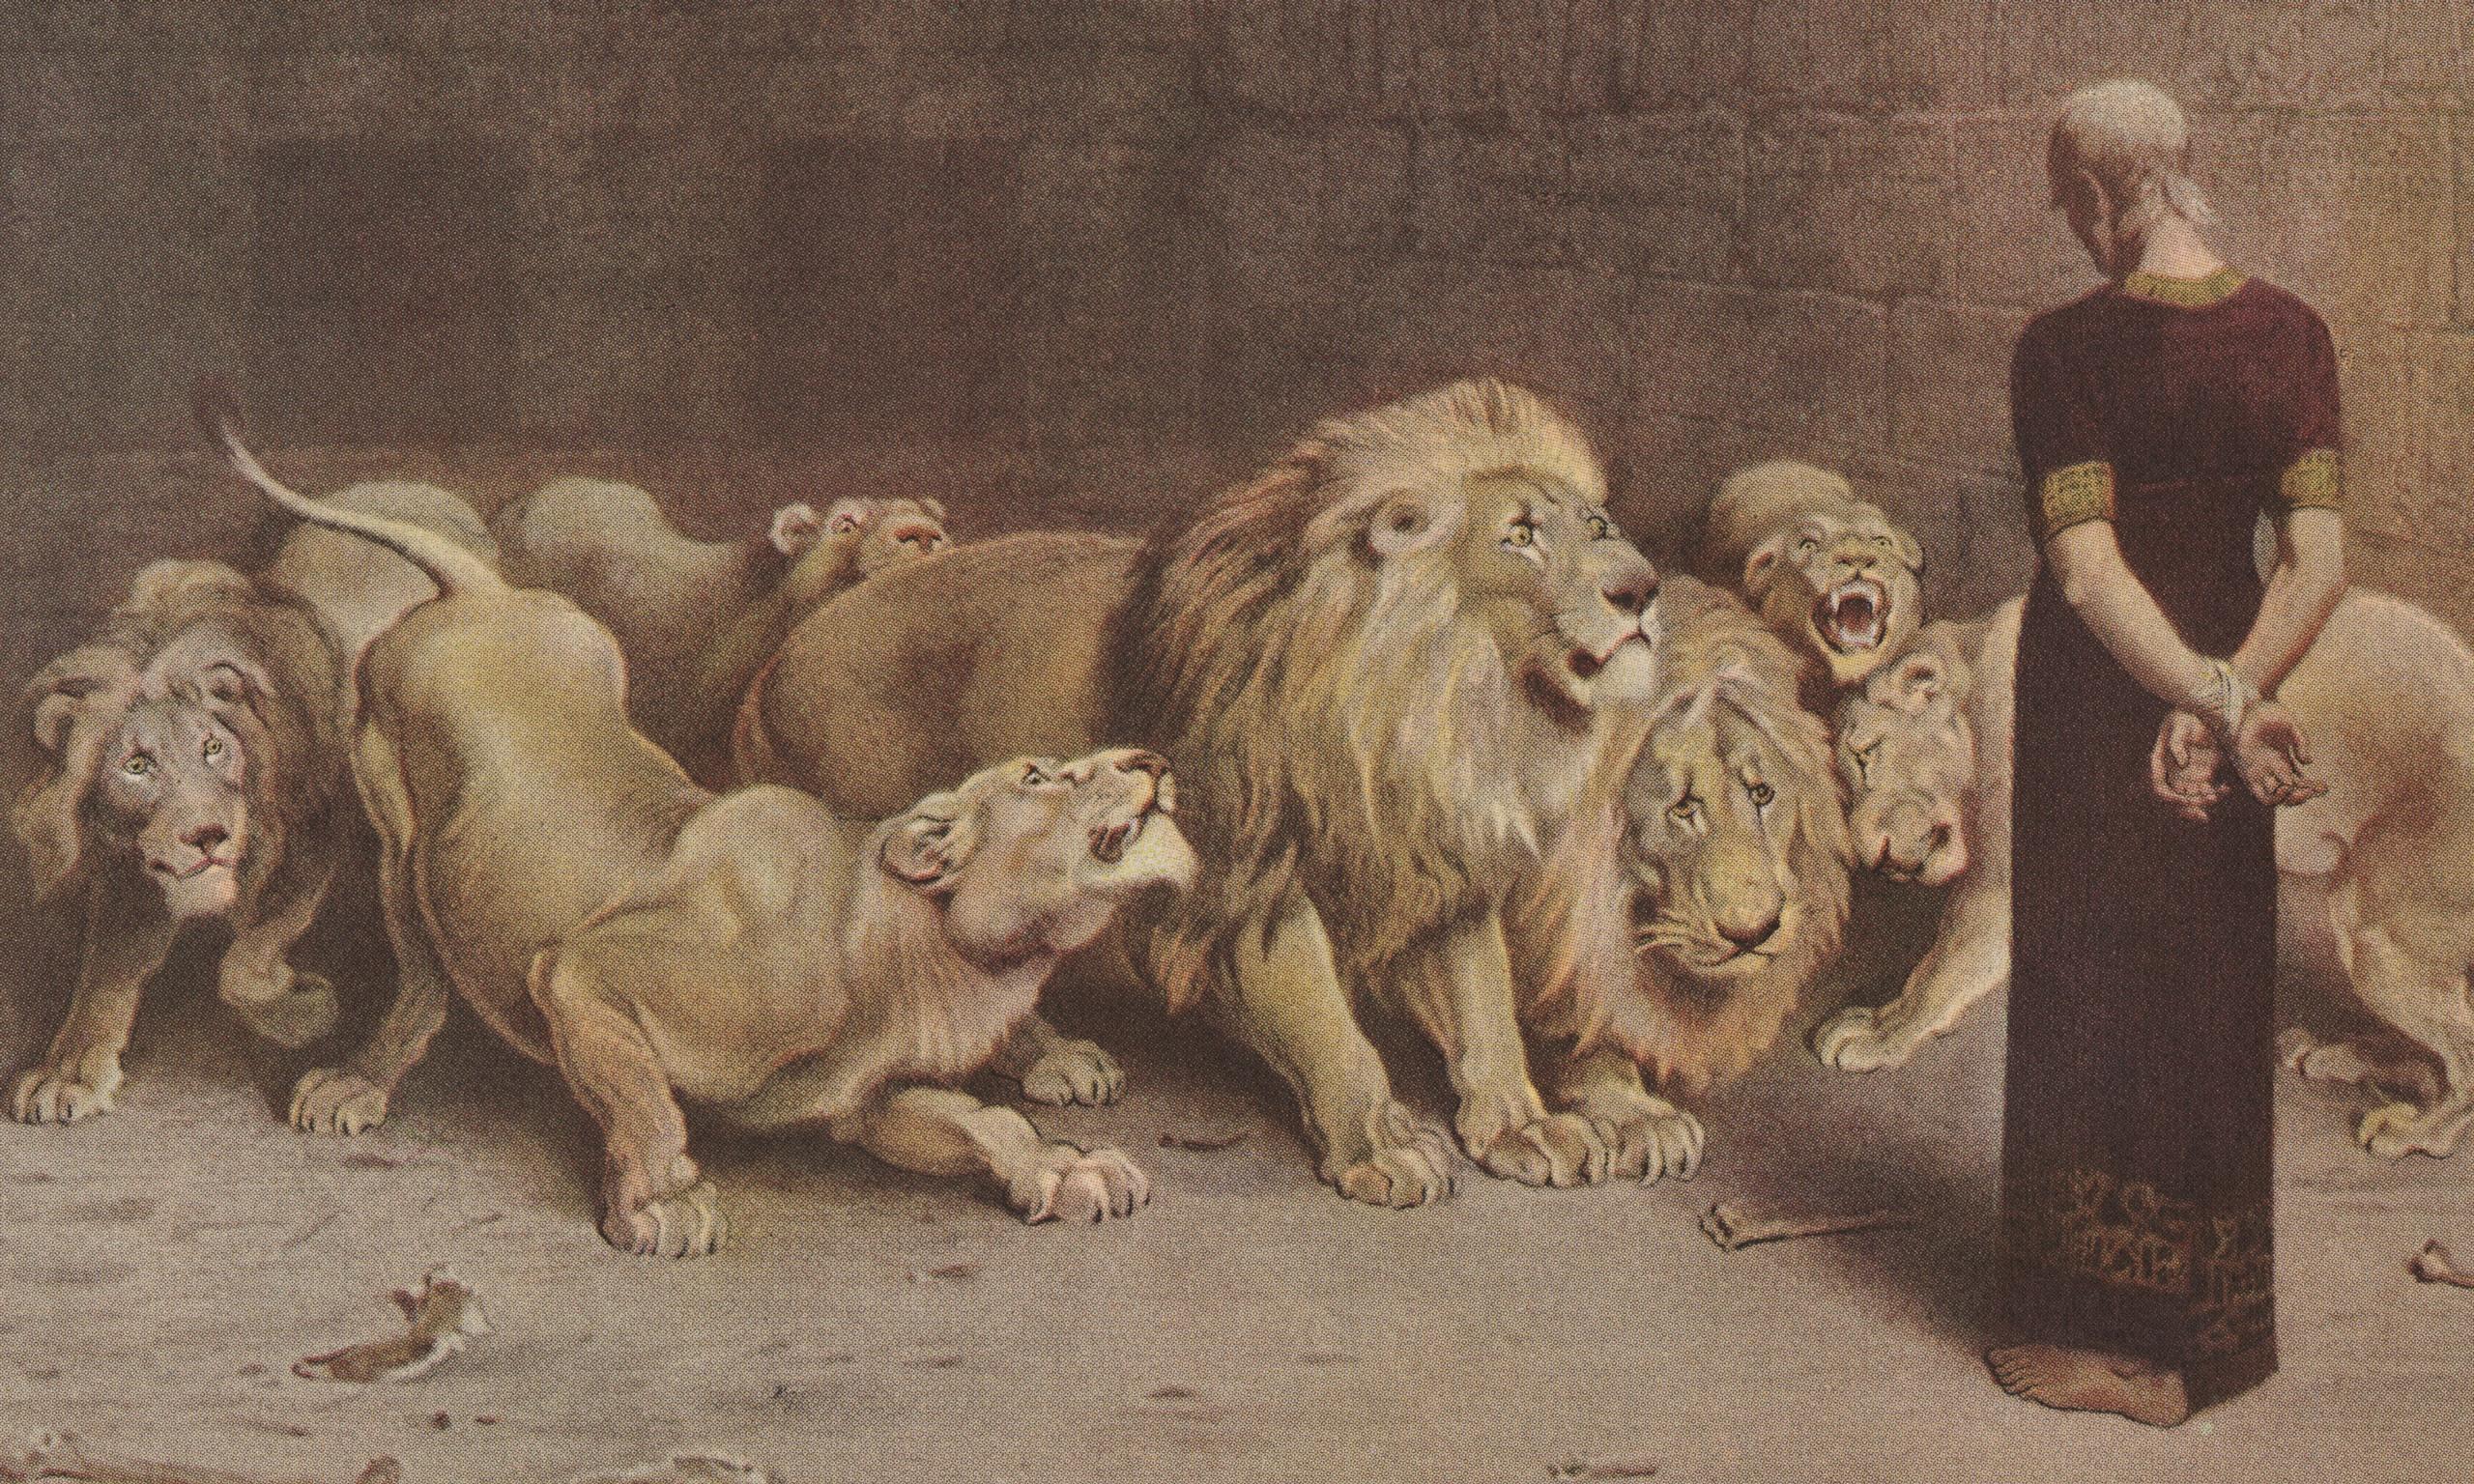 new musical u0027daniel in the lions u0027 den u0027 opens at lehman college may 12